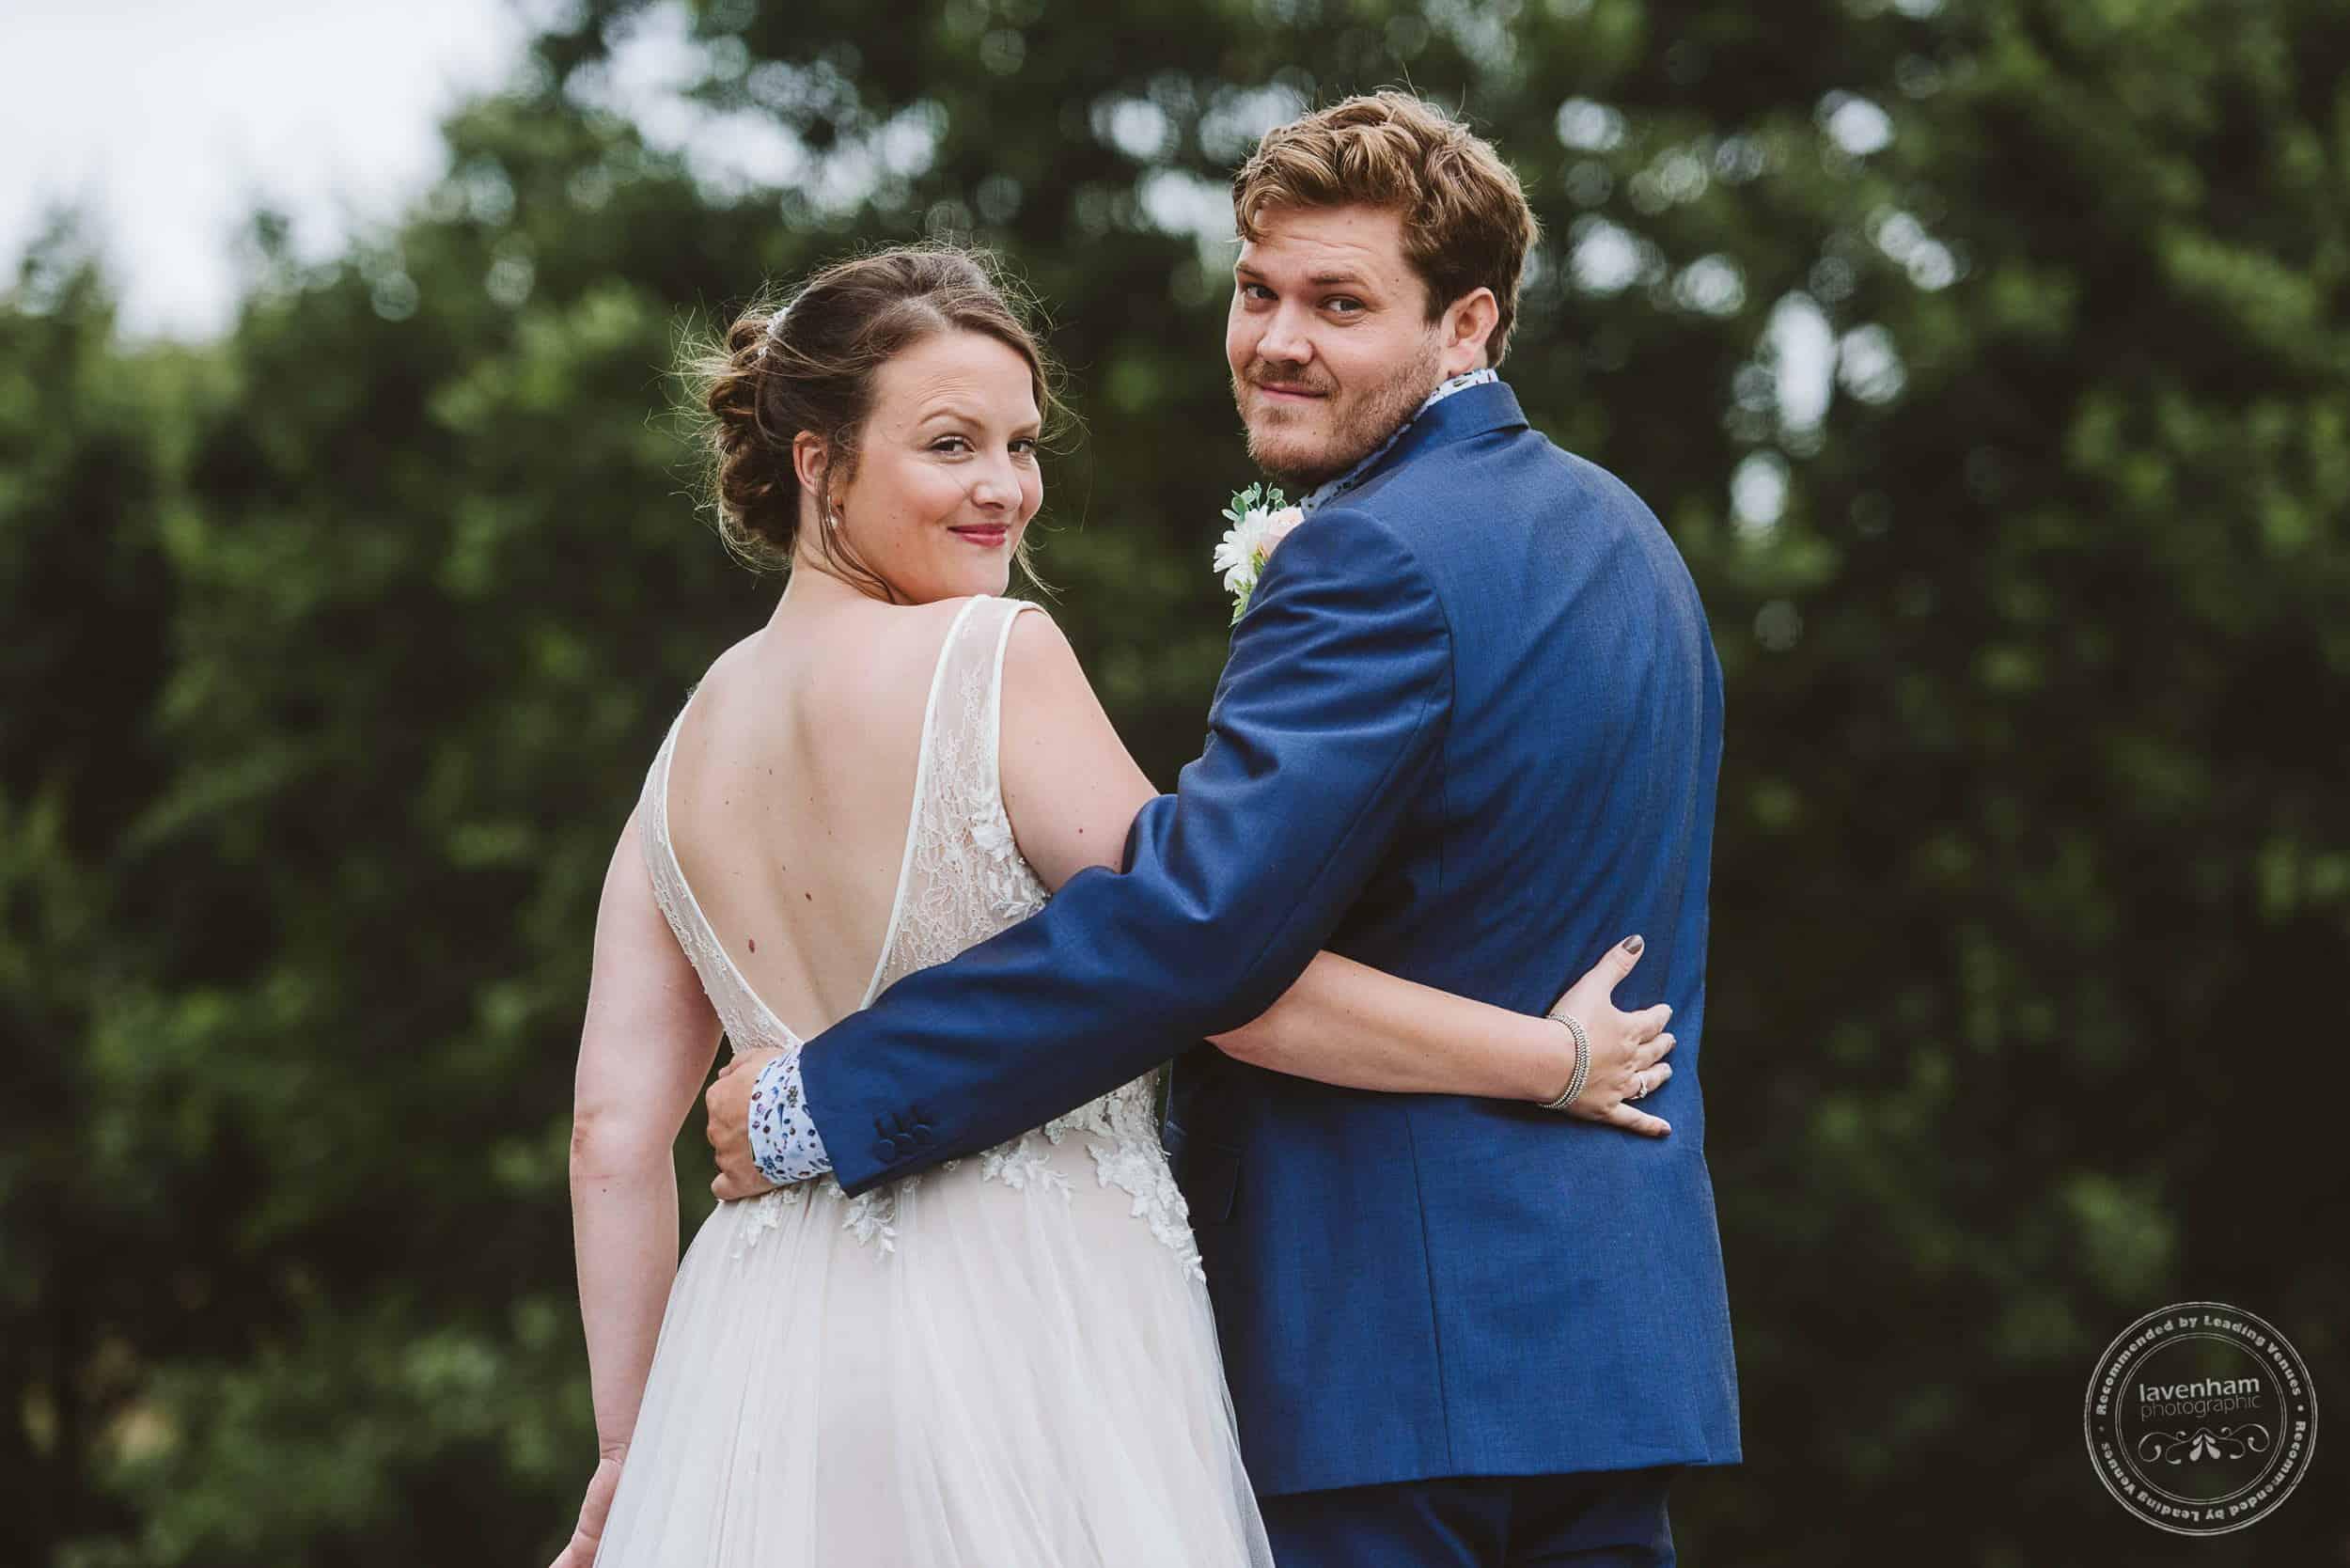 180818 Marks Hall Wedding Photography Lavenham Photographic 092